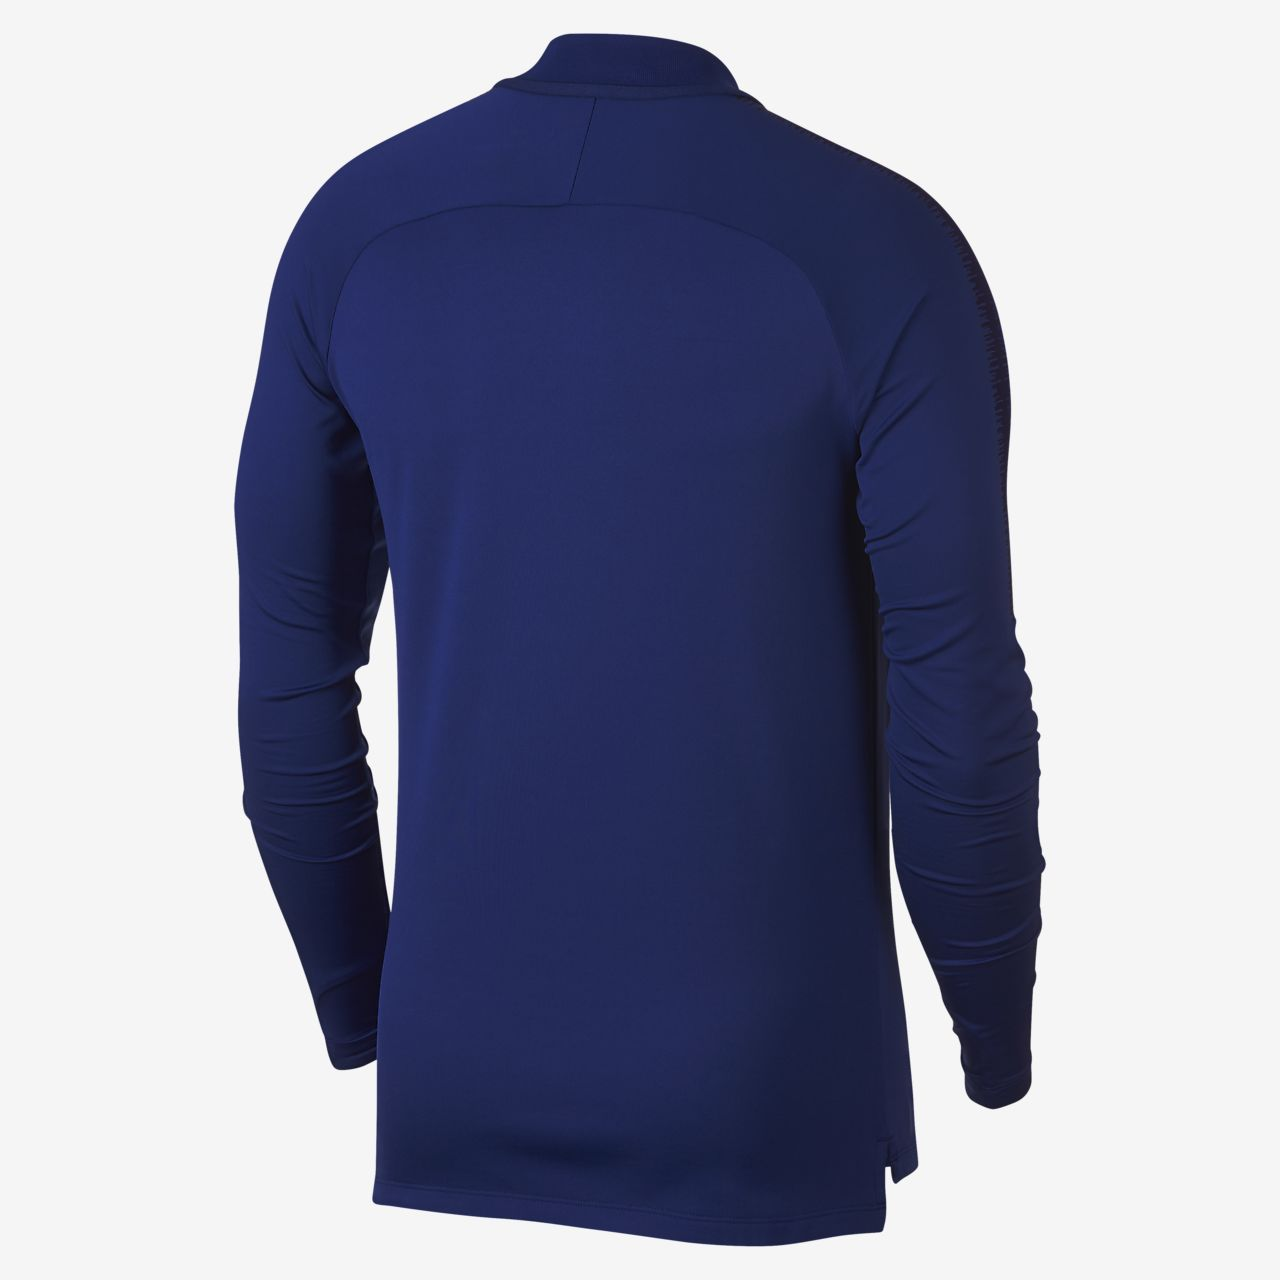 54f03295 Nike Dri-FIT Squad Drill Men's Long-Sleeve Football Top. Nike.com BE